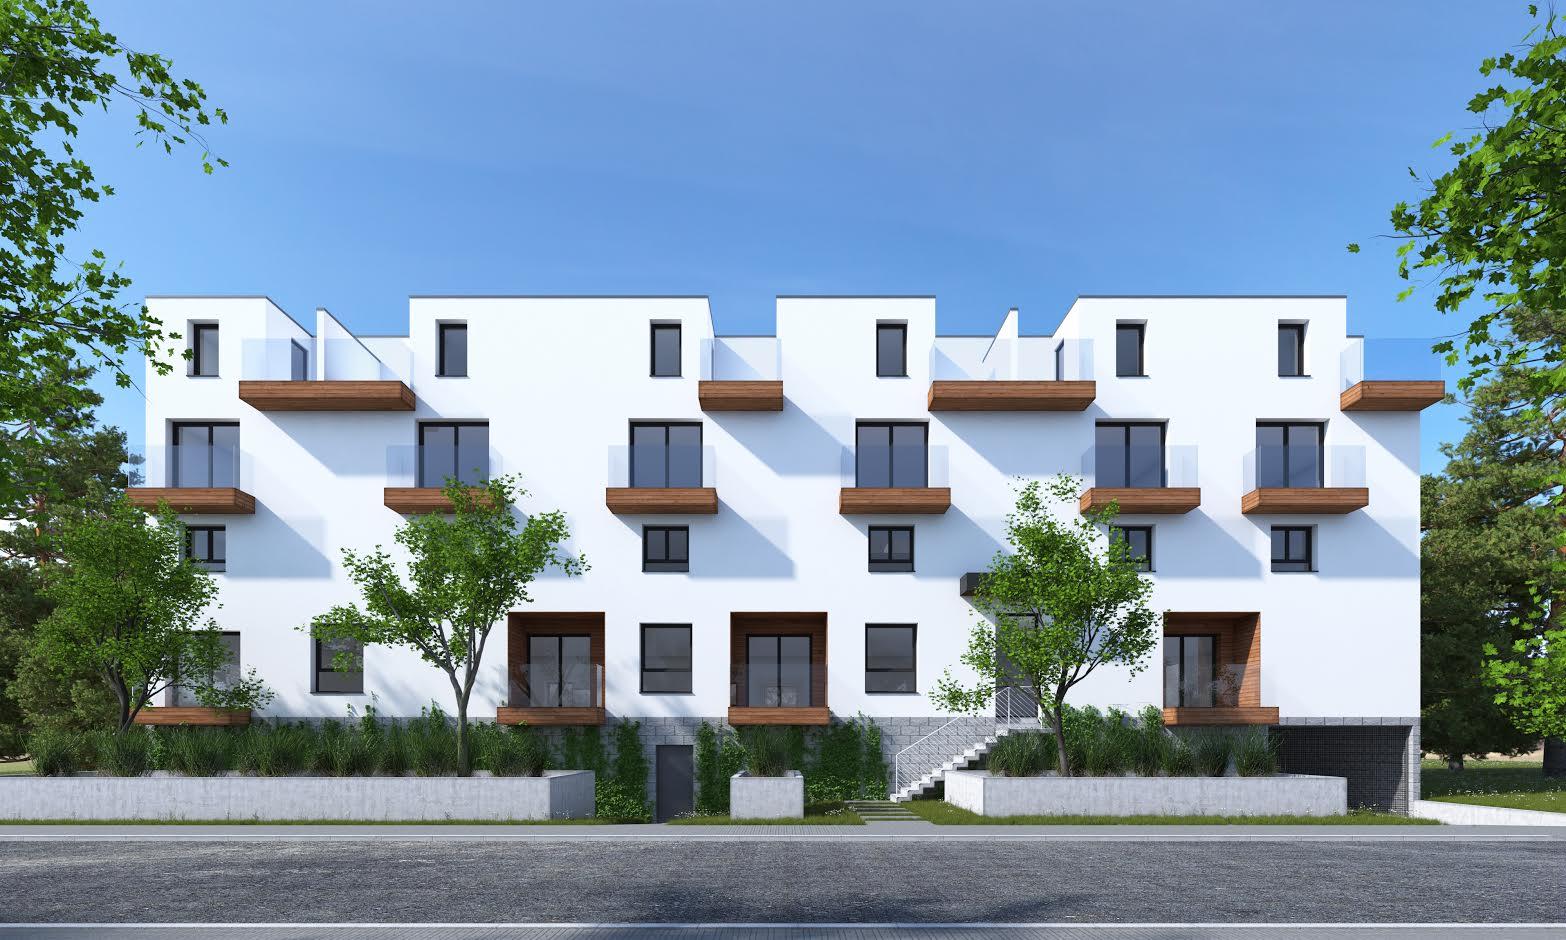 multi family development, real estate development, luxury, apartments, lofts, marina del rey, playa vista, silicon beach, culver city, mar vista, venice beach, los angeles, kenihan development